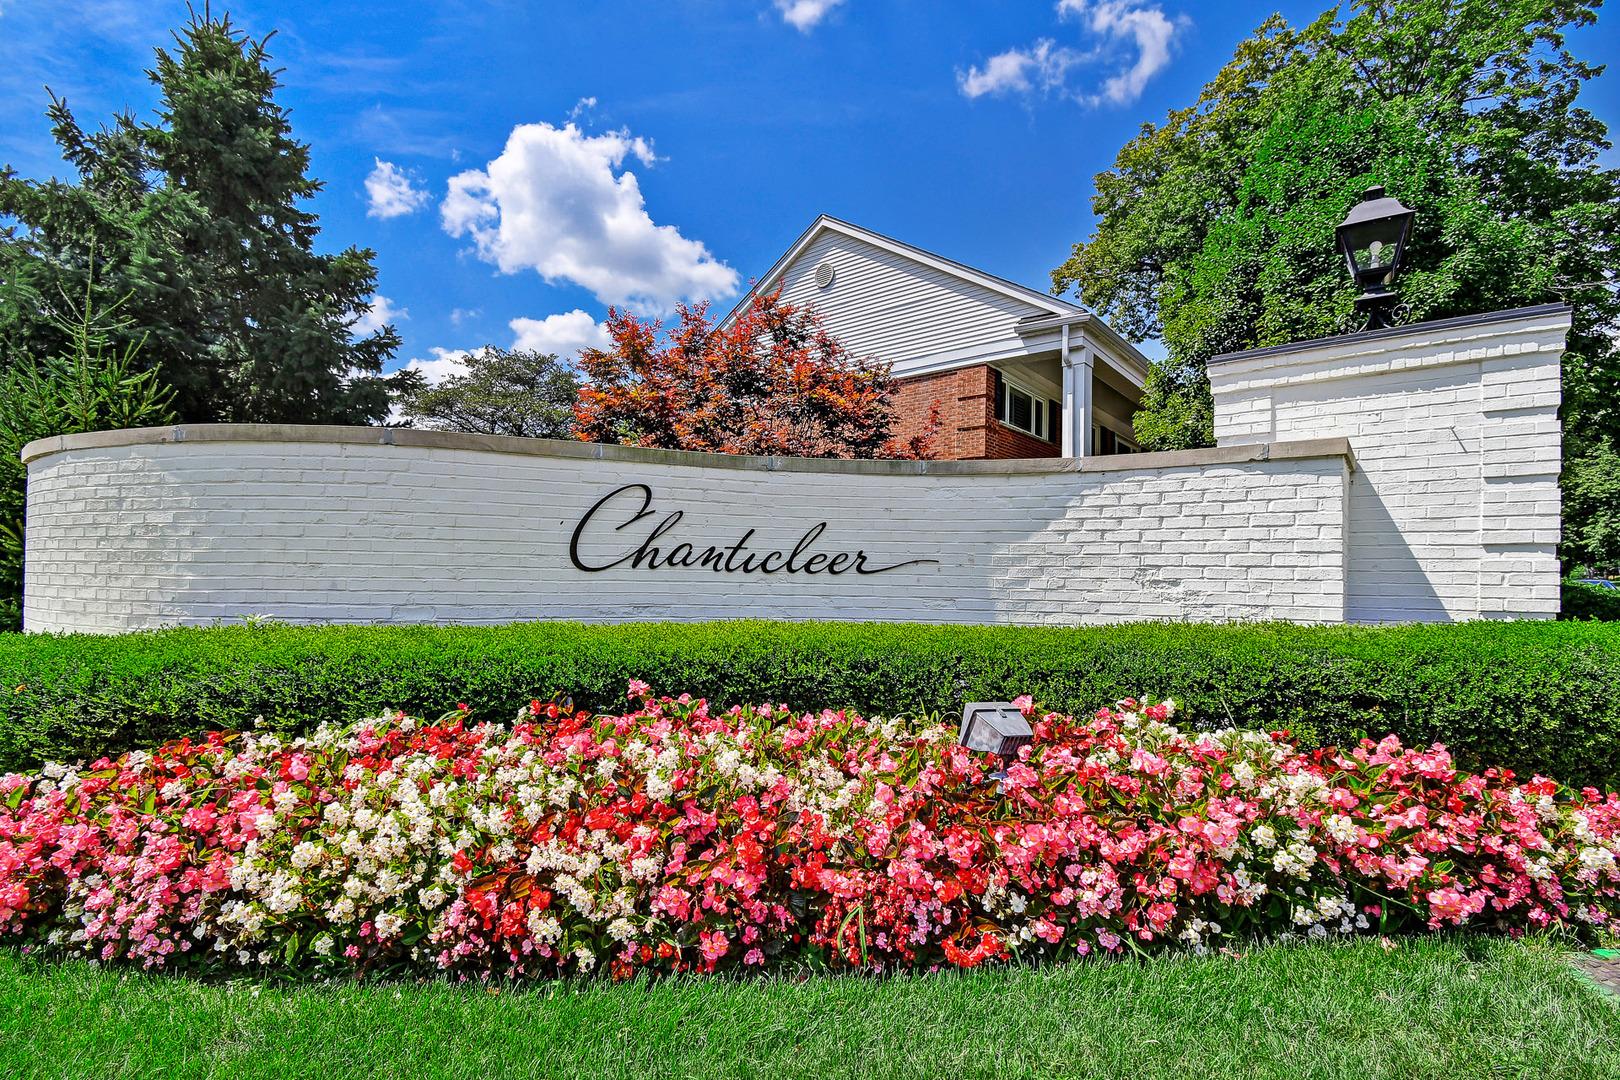 404 Chanticleer, Hinsdale, Illinois, 60521